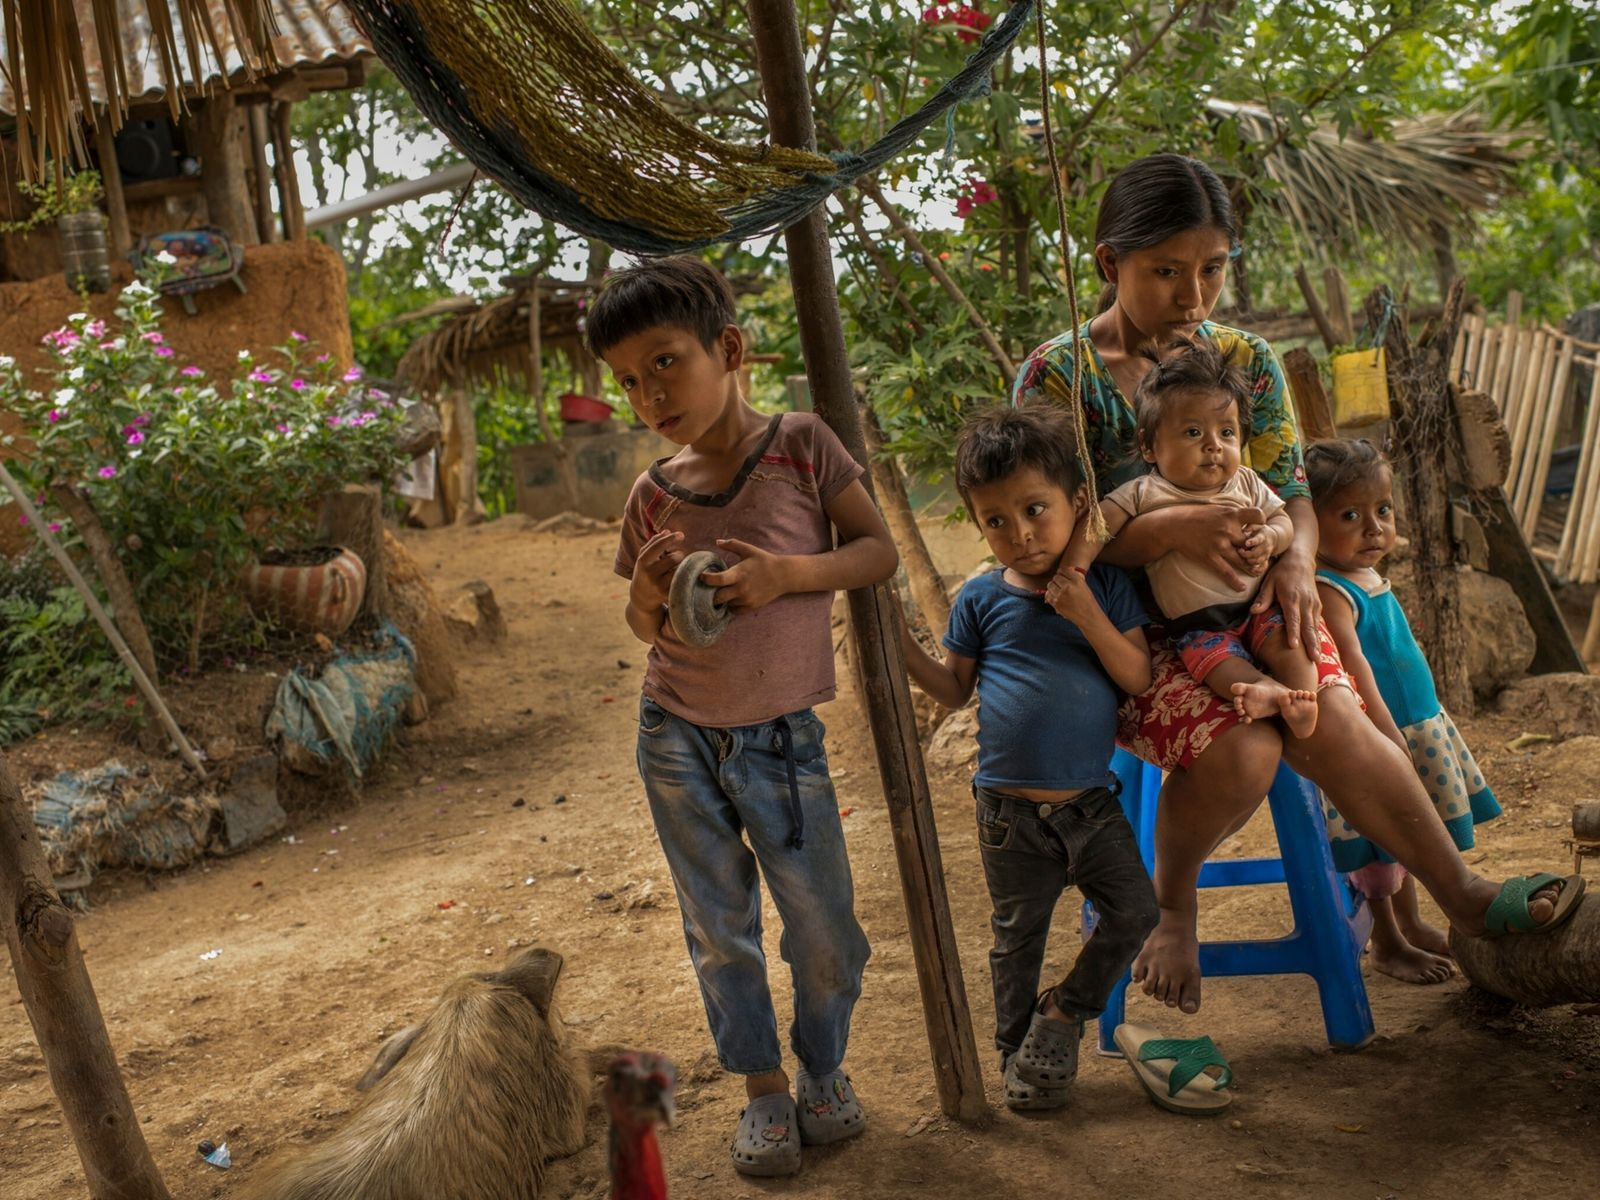 Hunger is a familiar feeling for families like María Elisa García's in a region of far ...